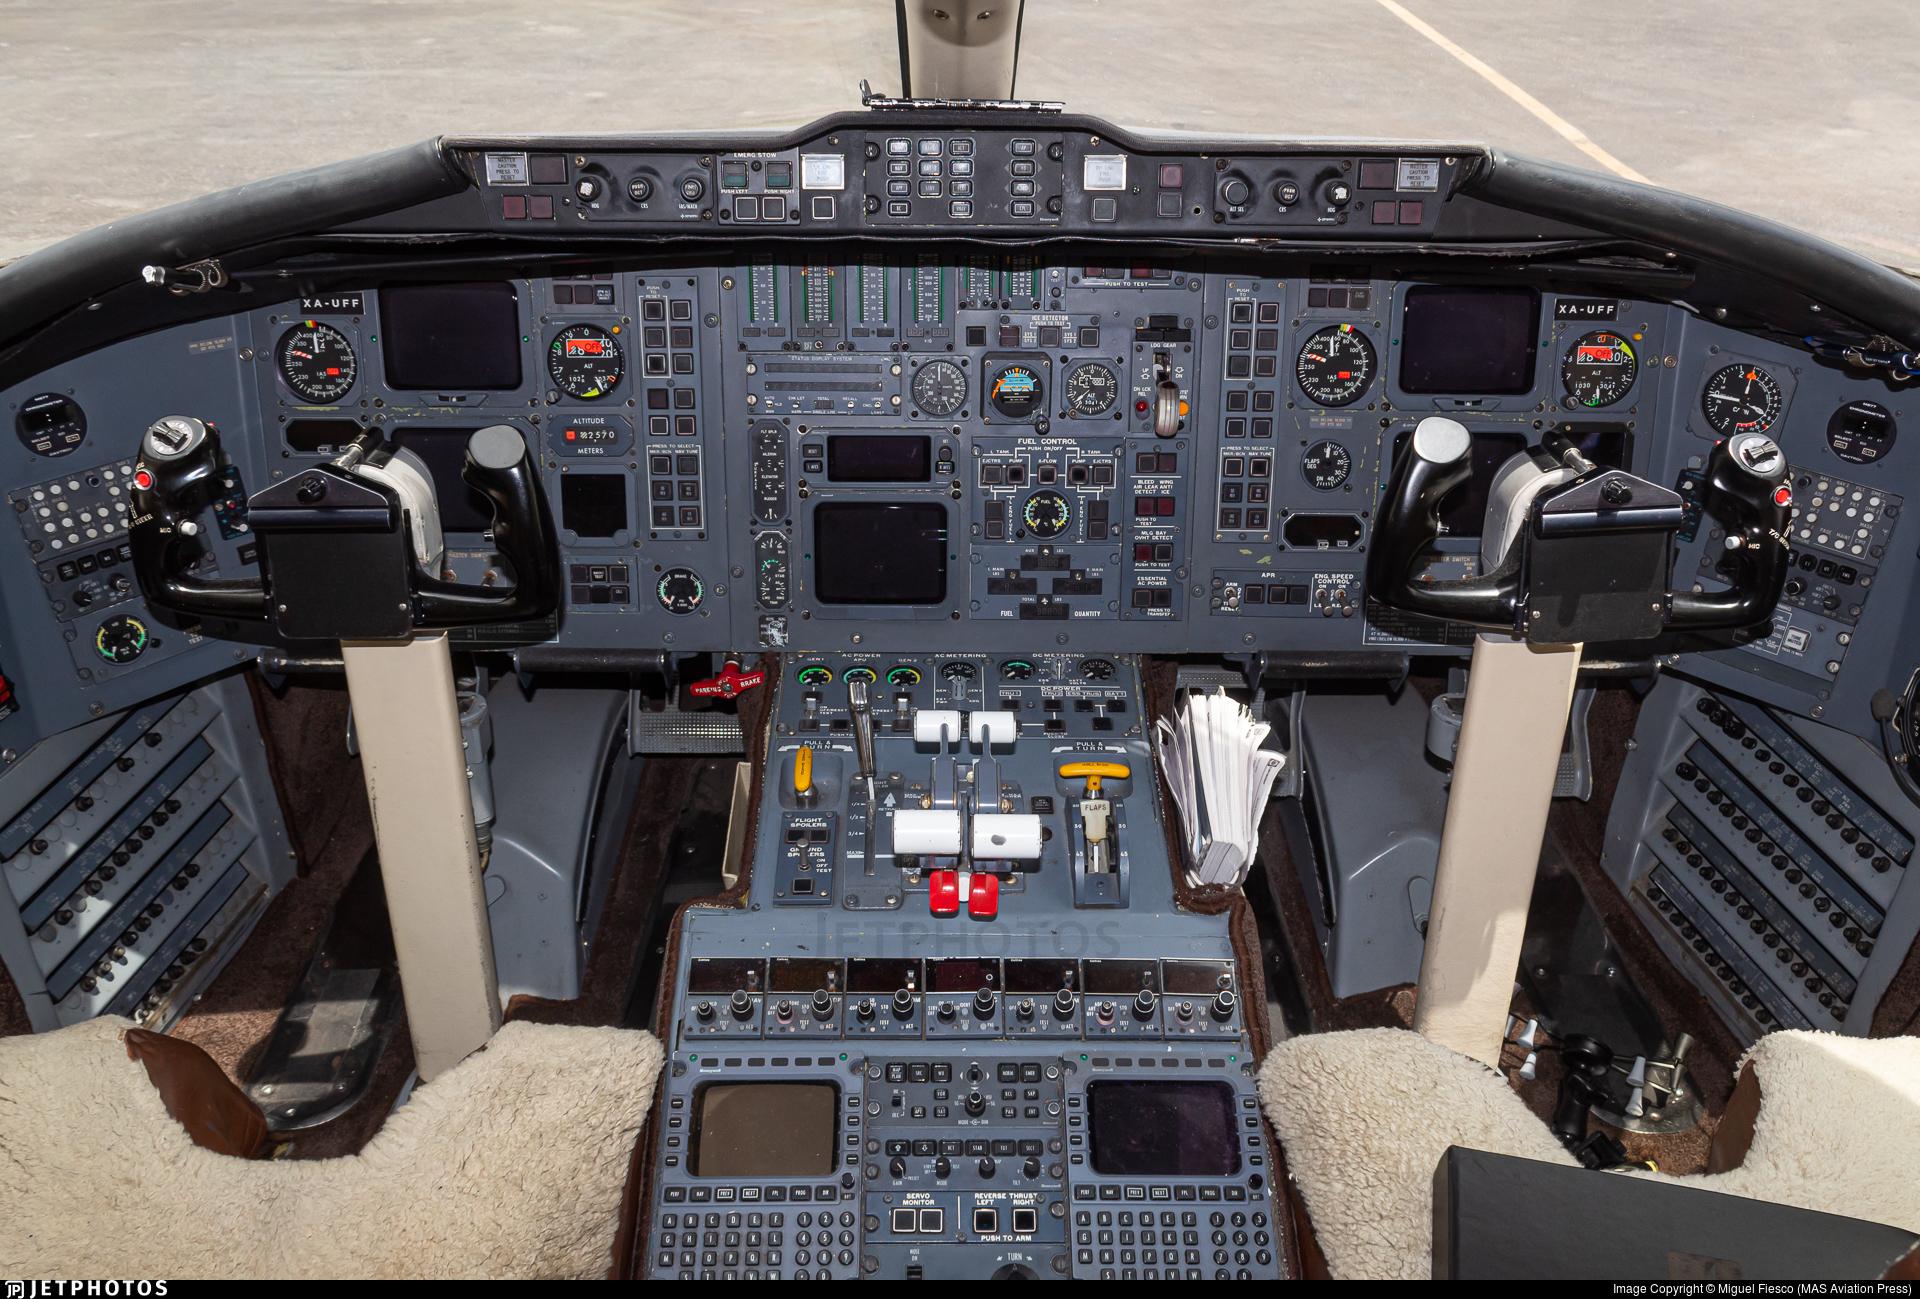 XA-UFF - Bombardier CL-600-2B16 Challenger 601-3A - ND AeroTaxis